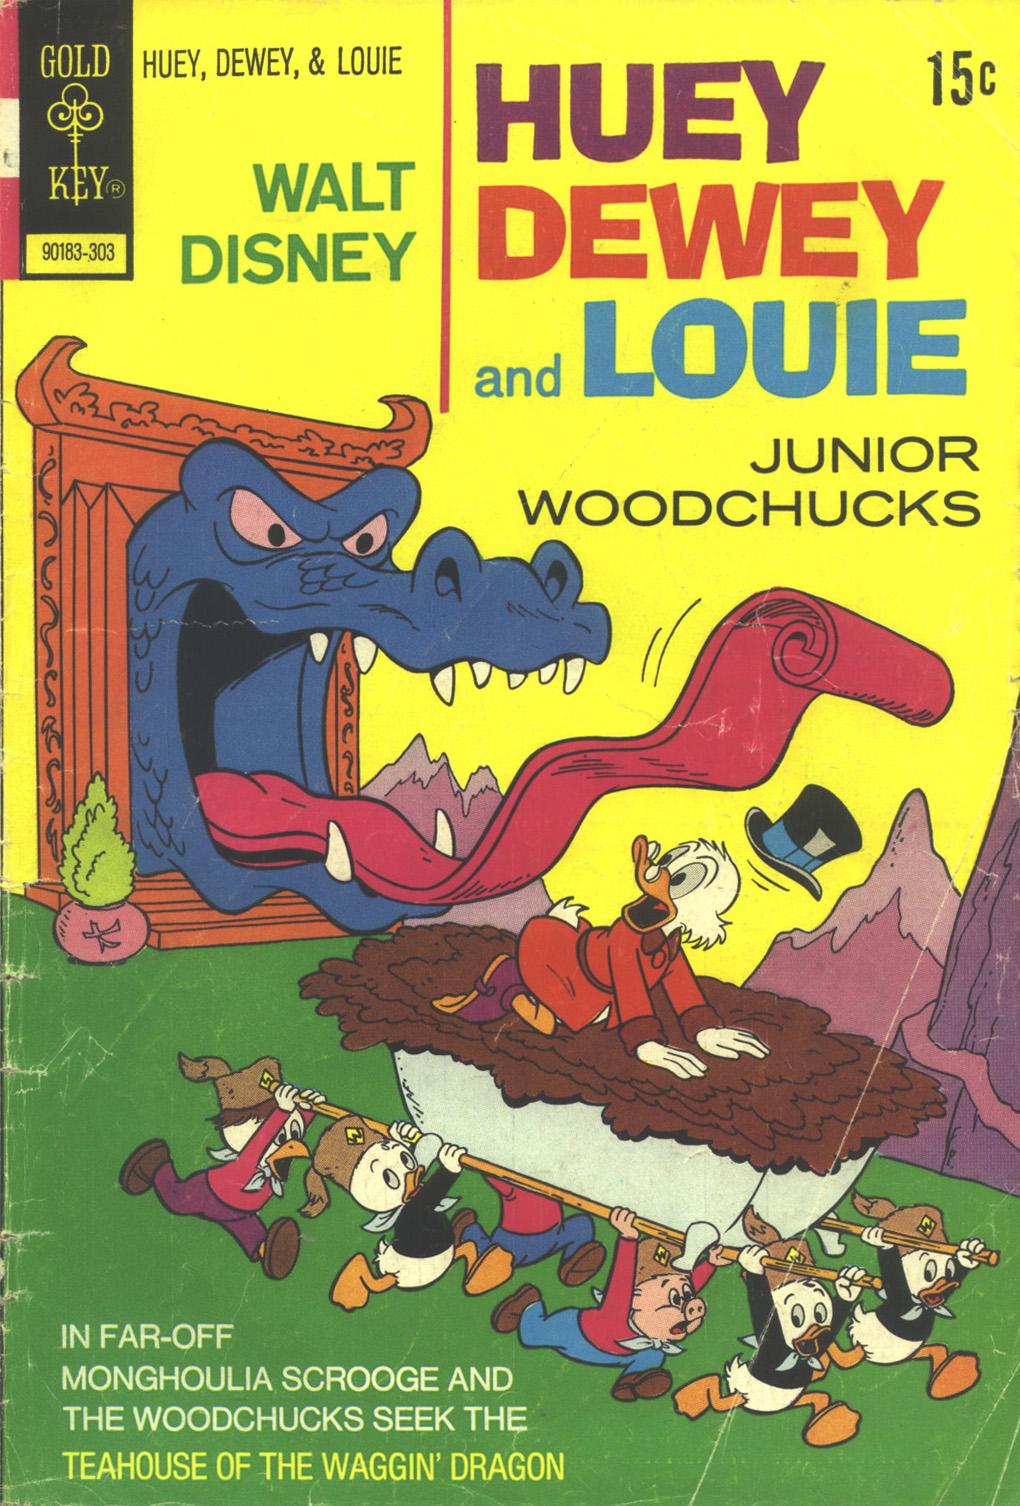 Huey, Dewey, and Louie Junior Woodchucks 19 Page 1